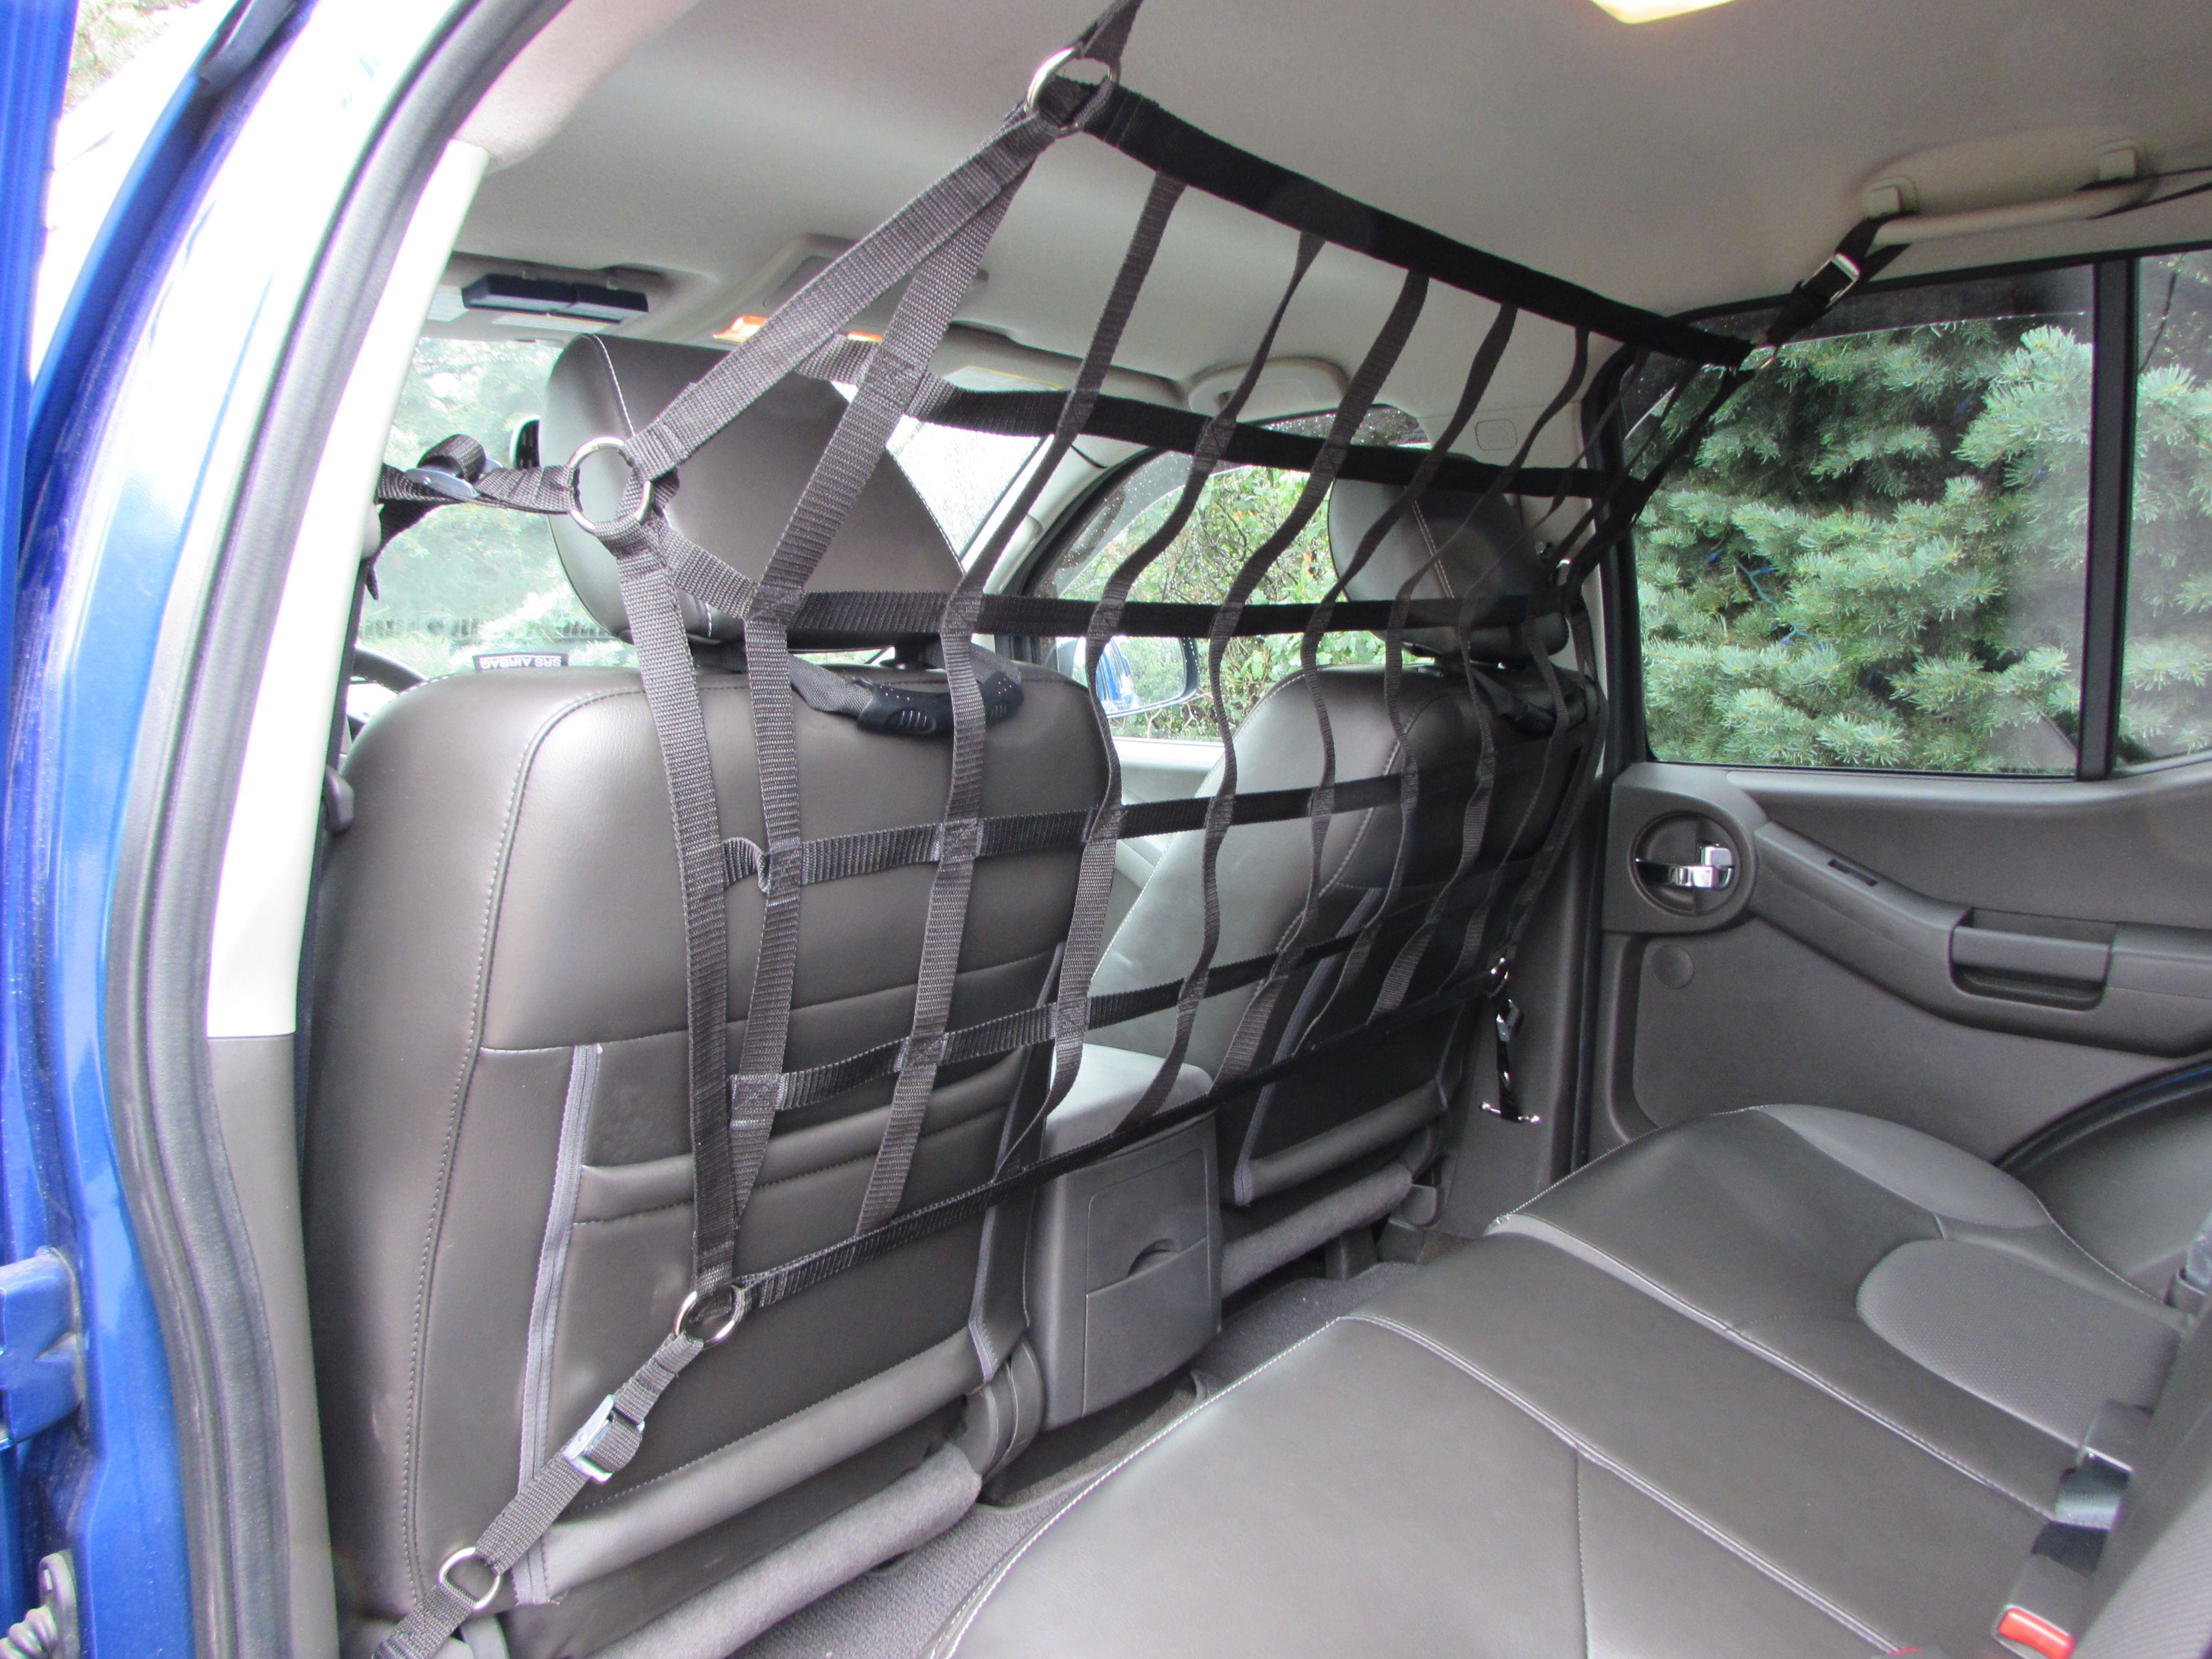 2004 nissan xterra car seat covers velcromag. Black Bedroom Furniture Sets. Home Design Ideas